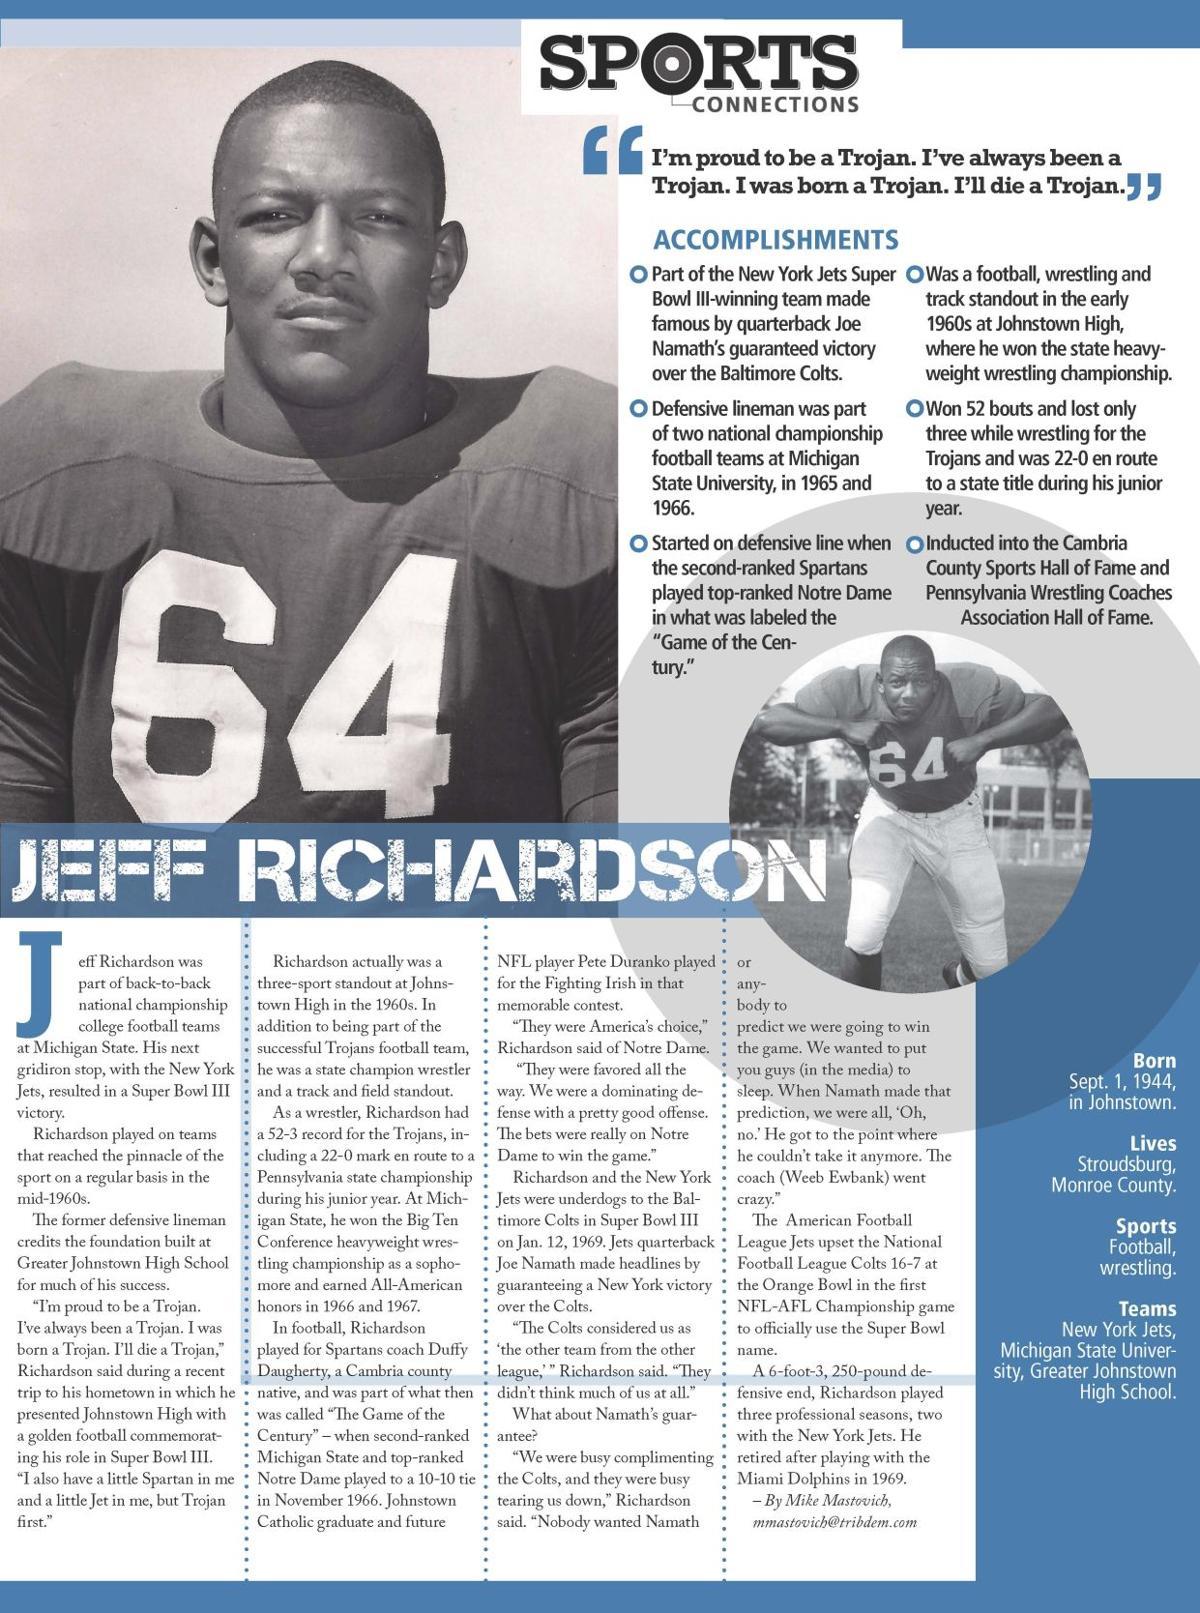 Jeff Richardson